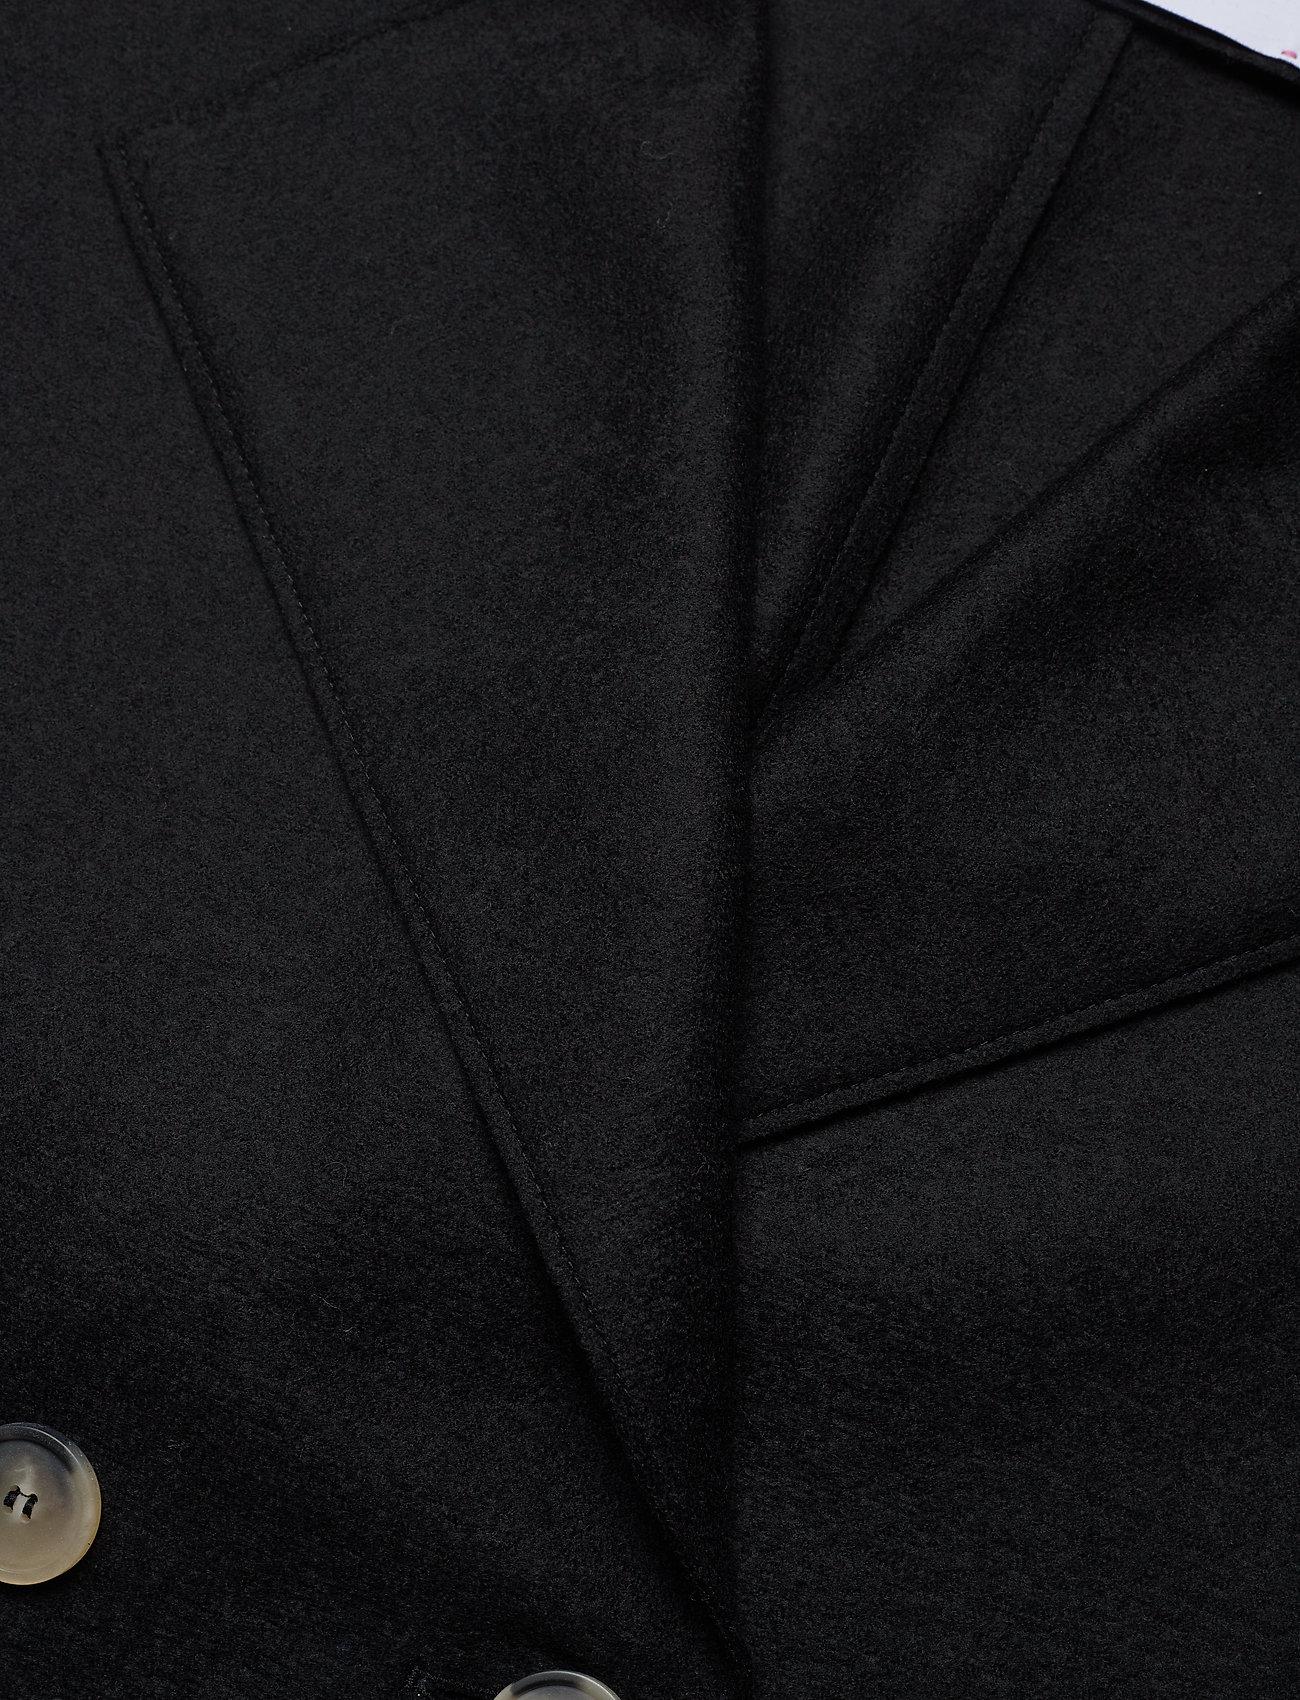 Harris Wharf London - Women Dropped Shoulder D. B. Jacket Light Pressed Wool - jacken - black - 2